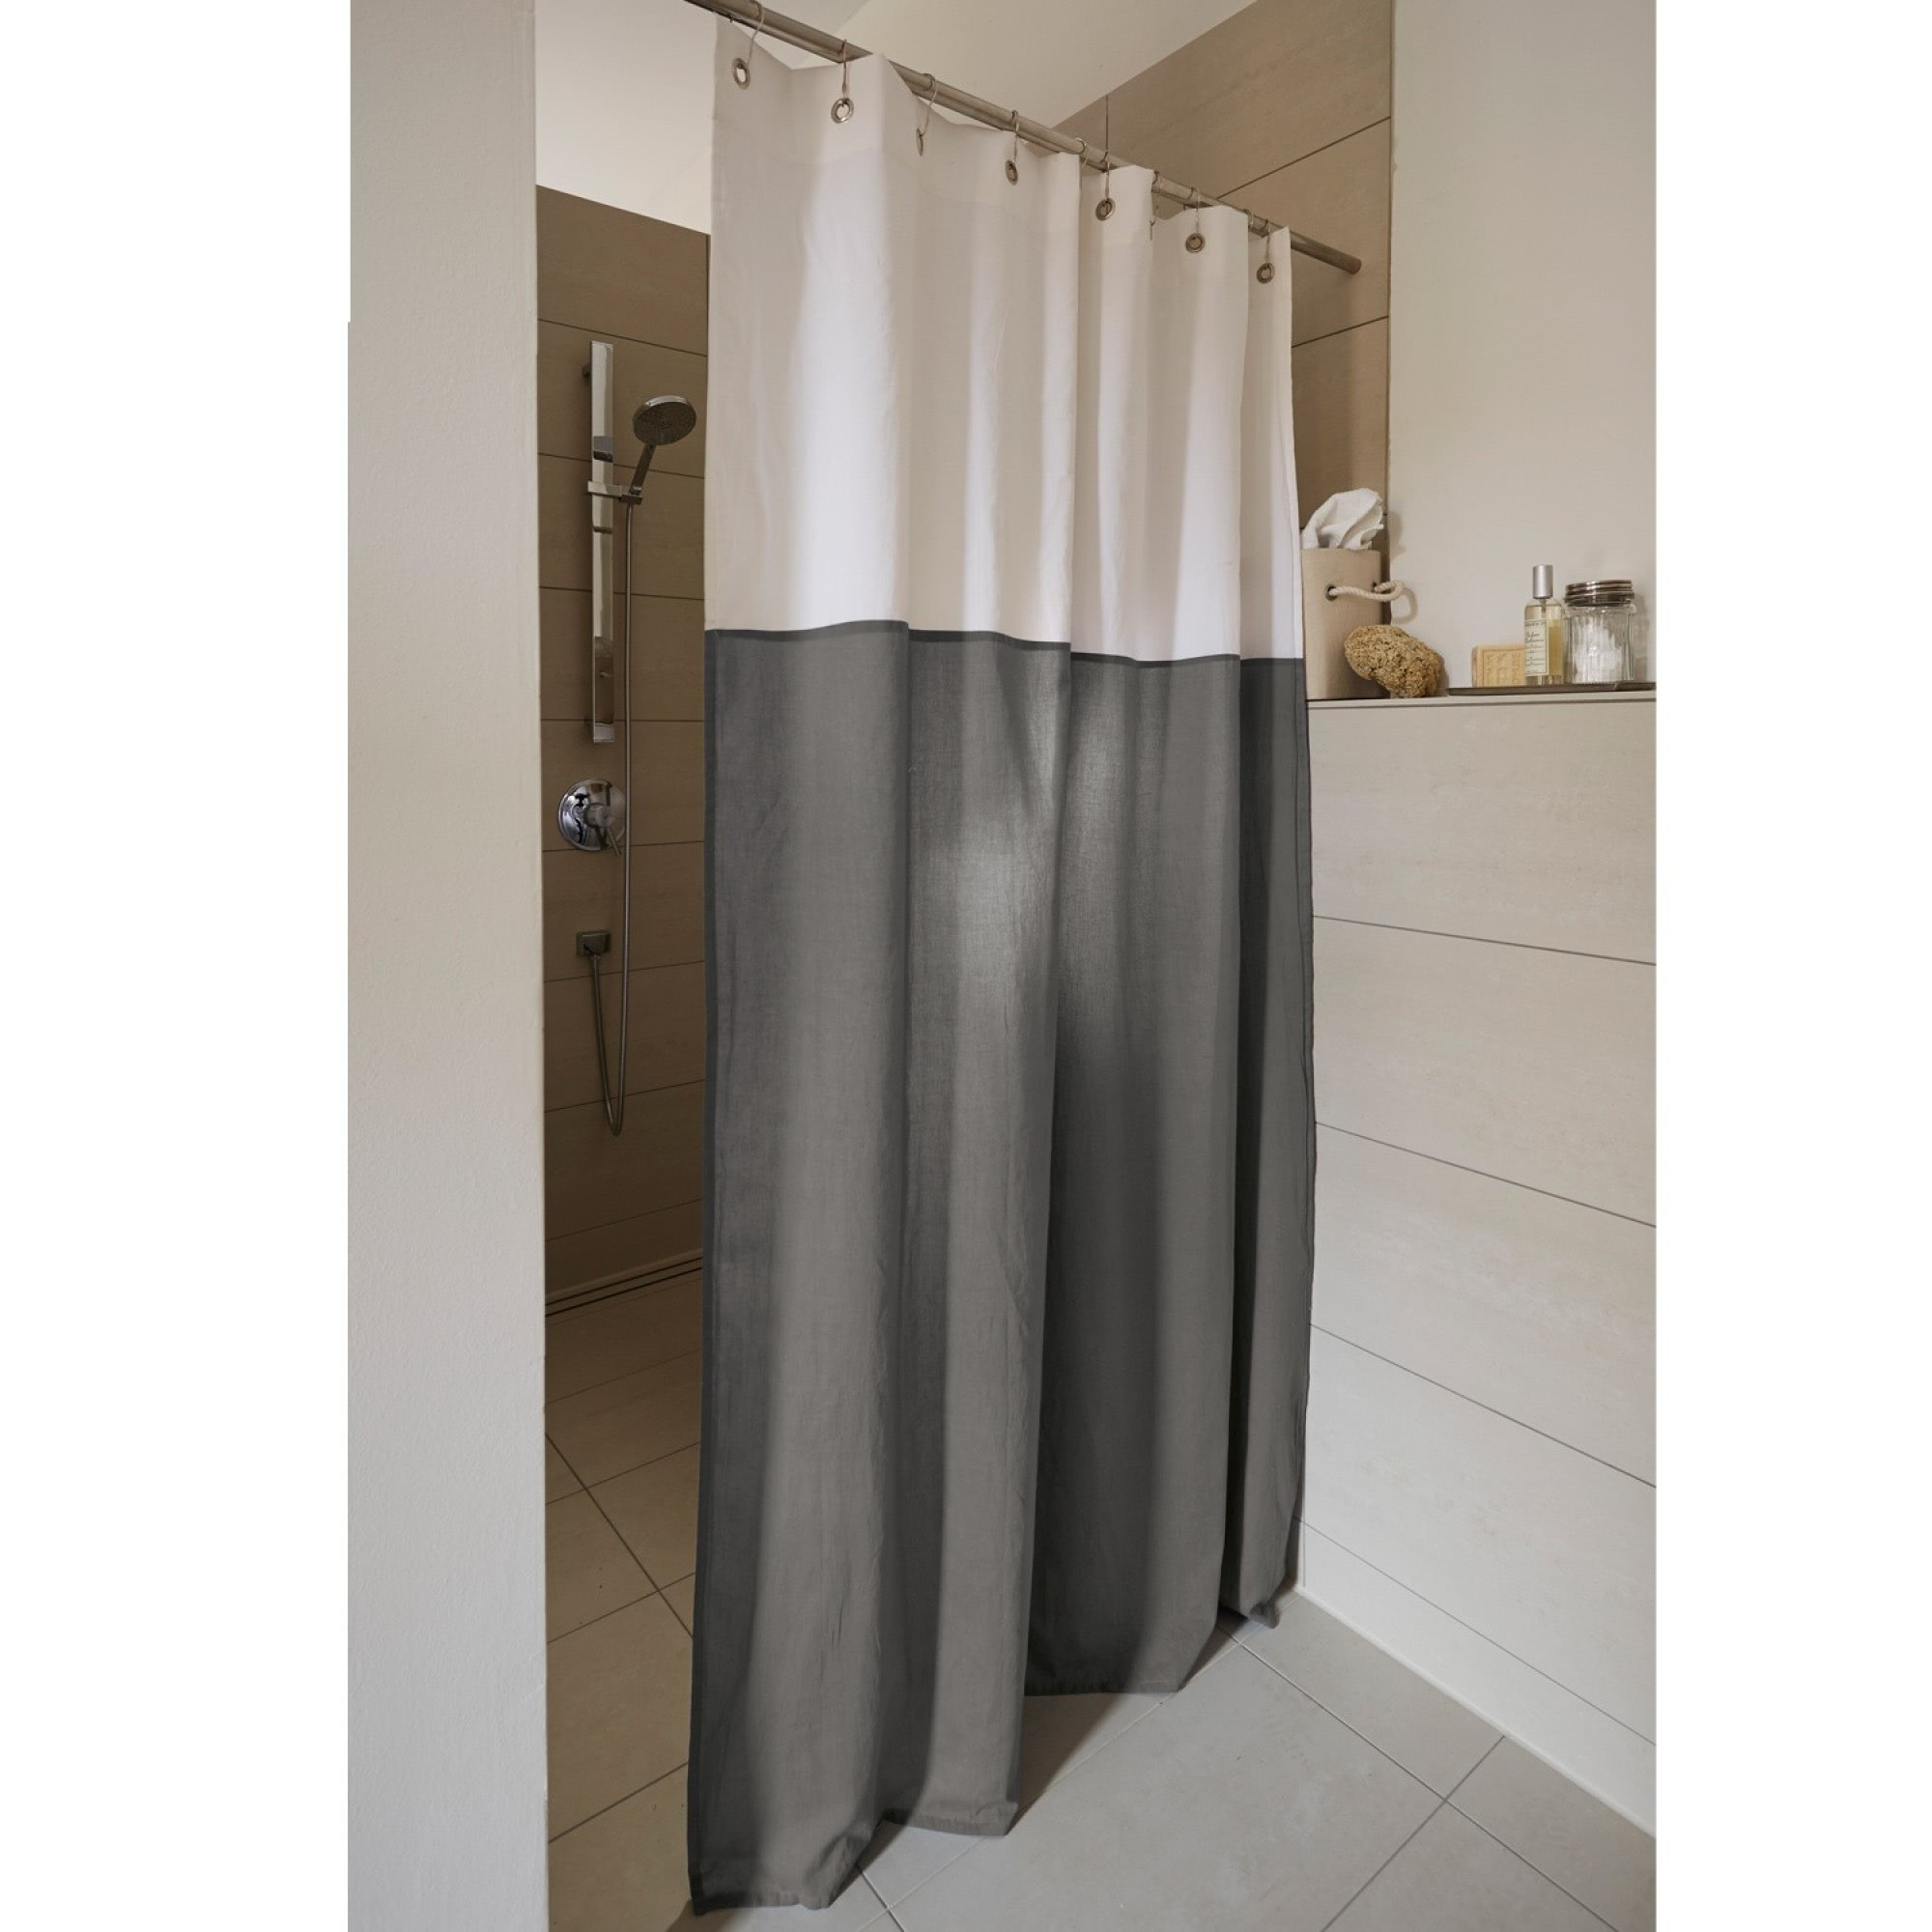 Duschvorhang Seilsystem duschvorhang seilsystem hausdesign pro